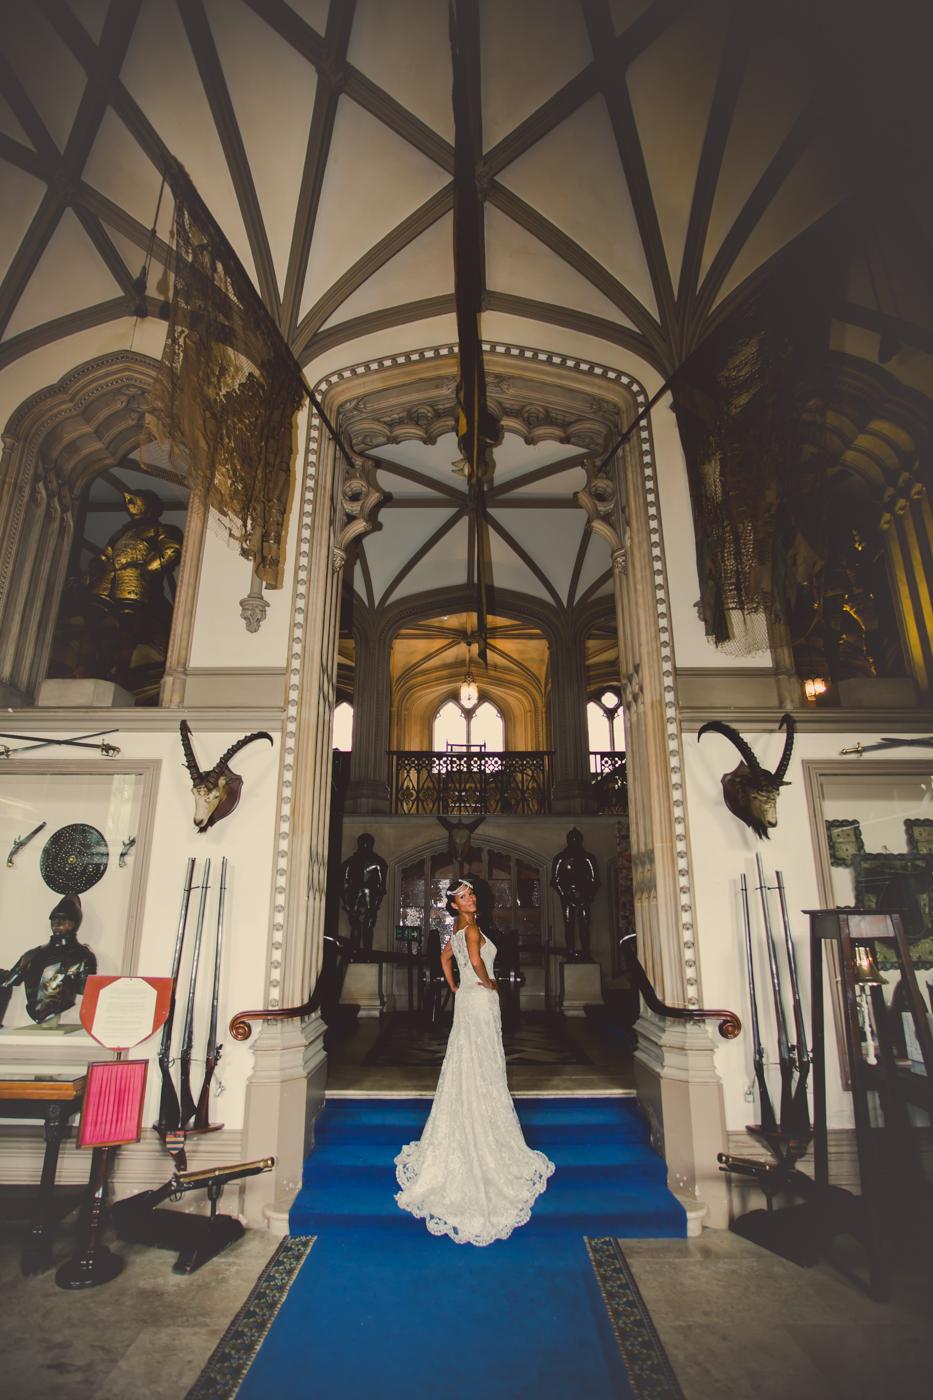 103 Donna and John Wedding Photography at Belvoir Castle www.belvoircastle.com UK by Mark Pugh.JPG